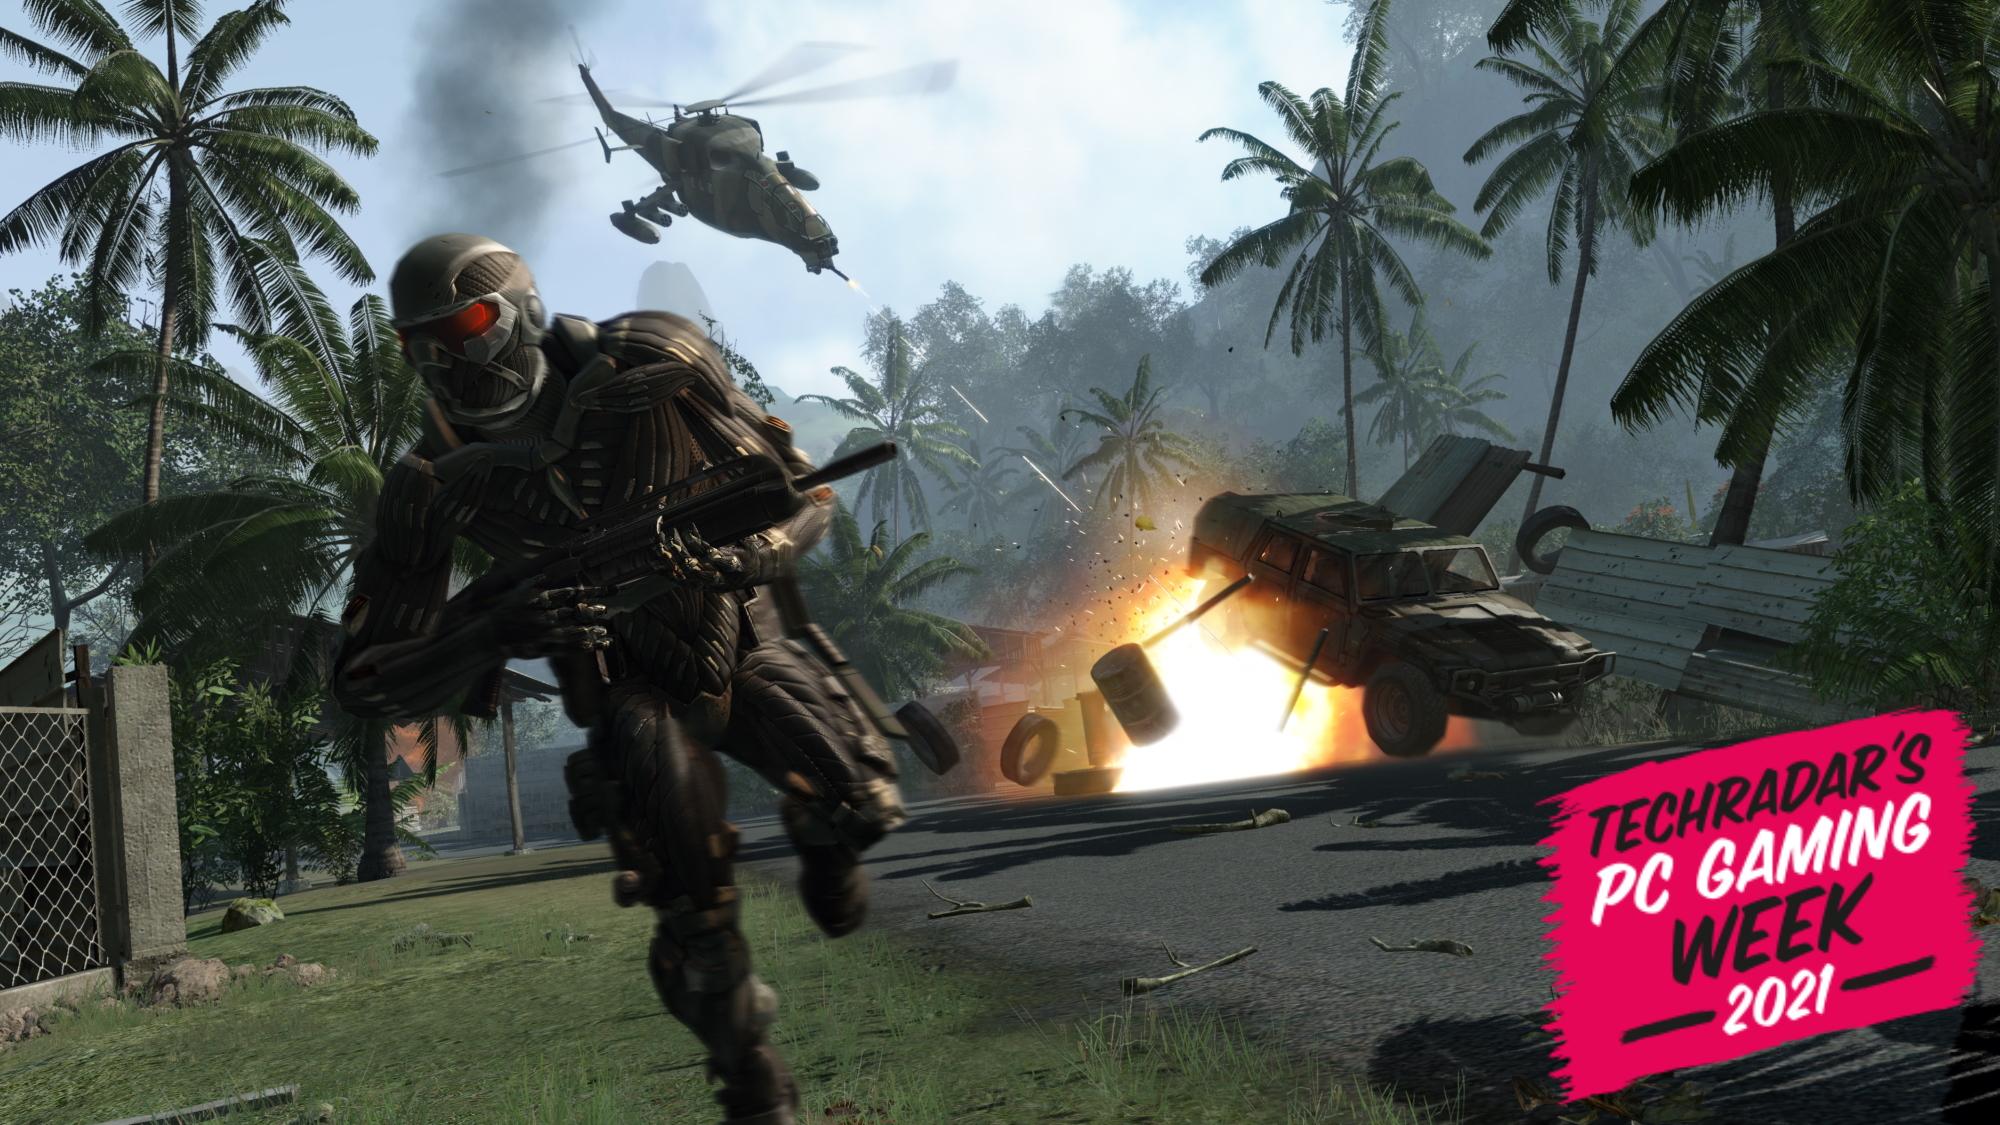 Screenshot of Crysis for TechRadar's PC Gaming Week 2021